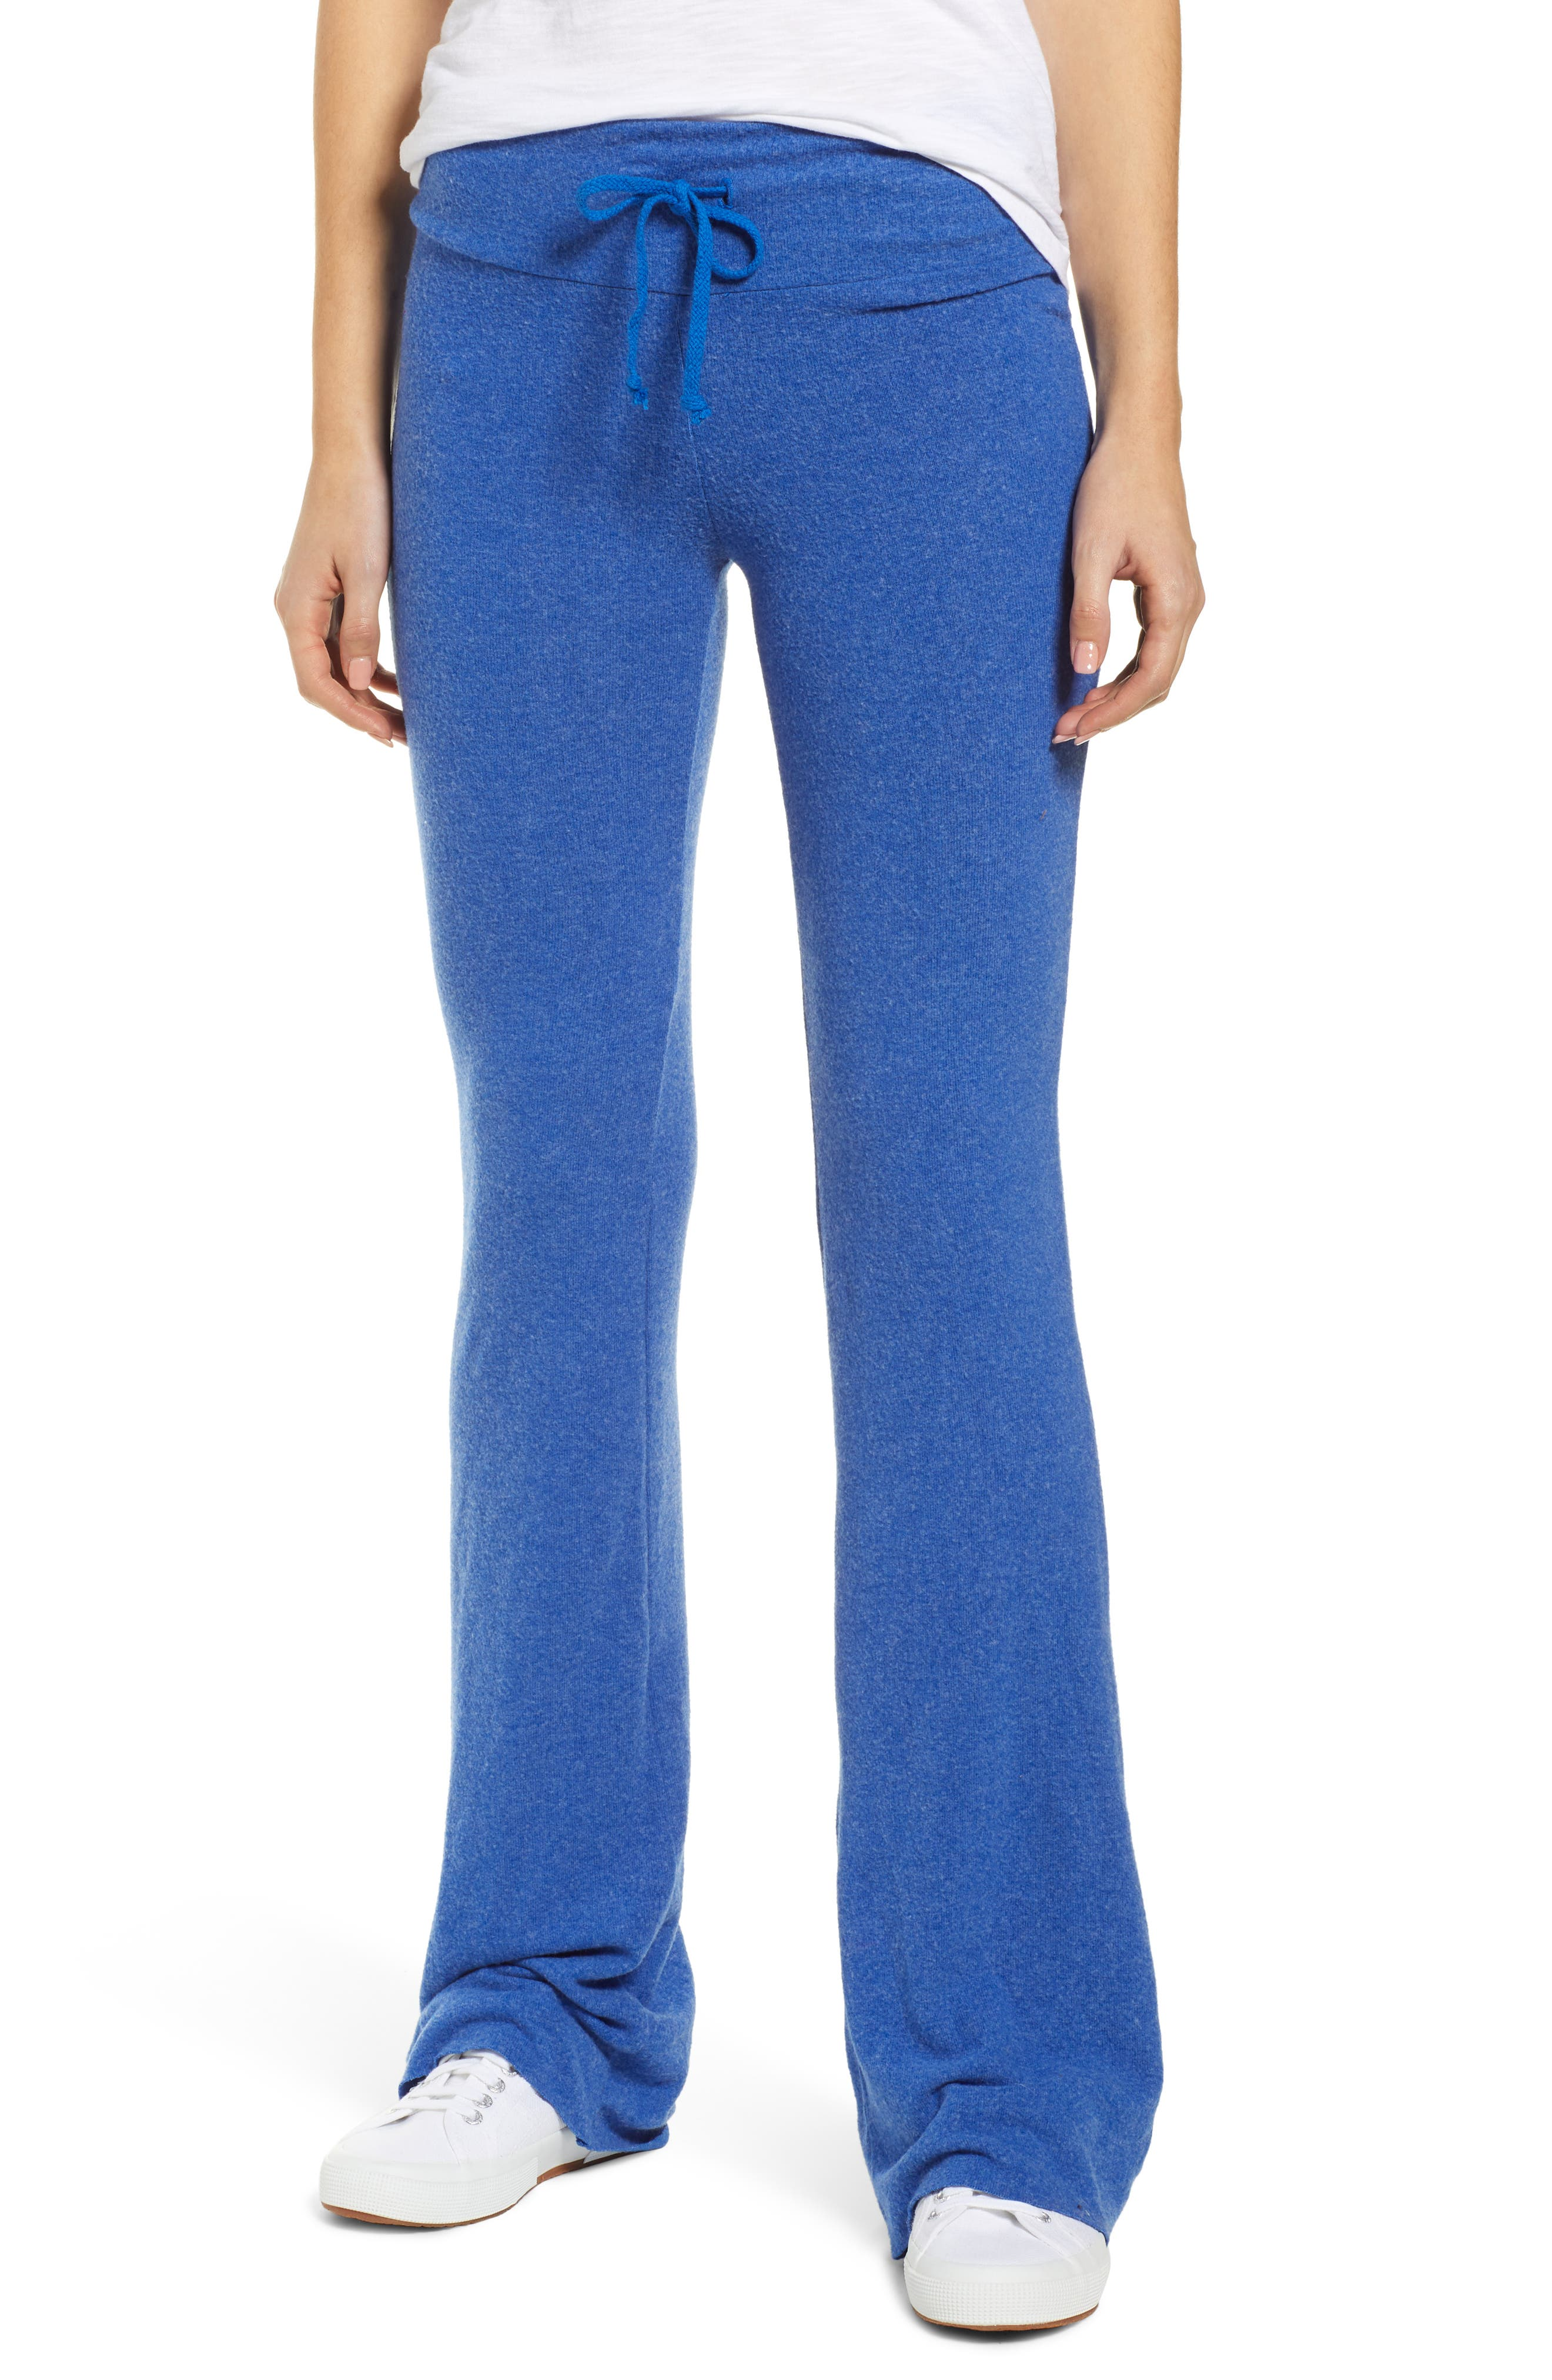 Tennis Club Fleece Pants,                         Main,                         color, 421